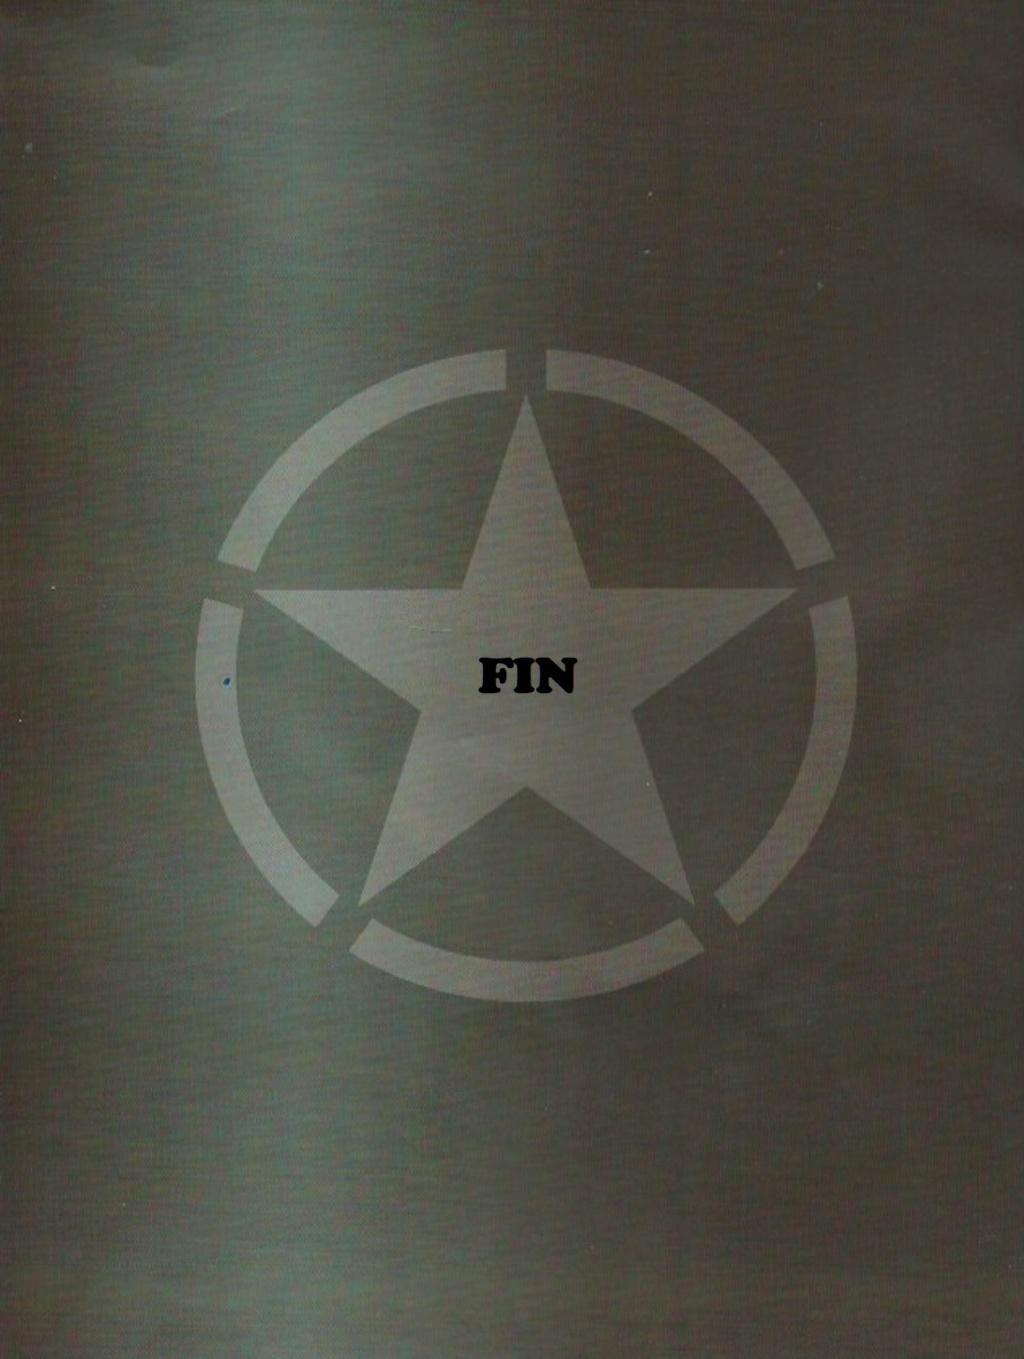 fin_de14.jpg